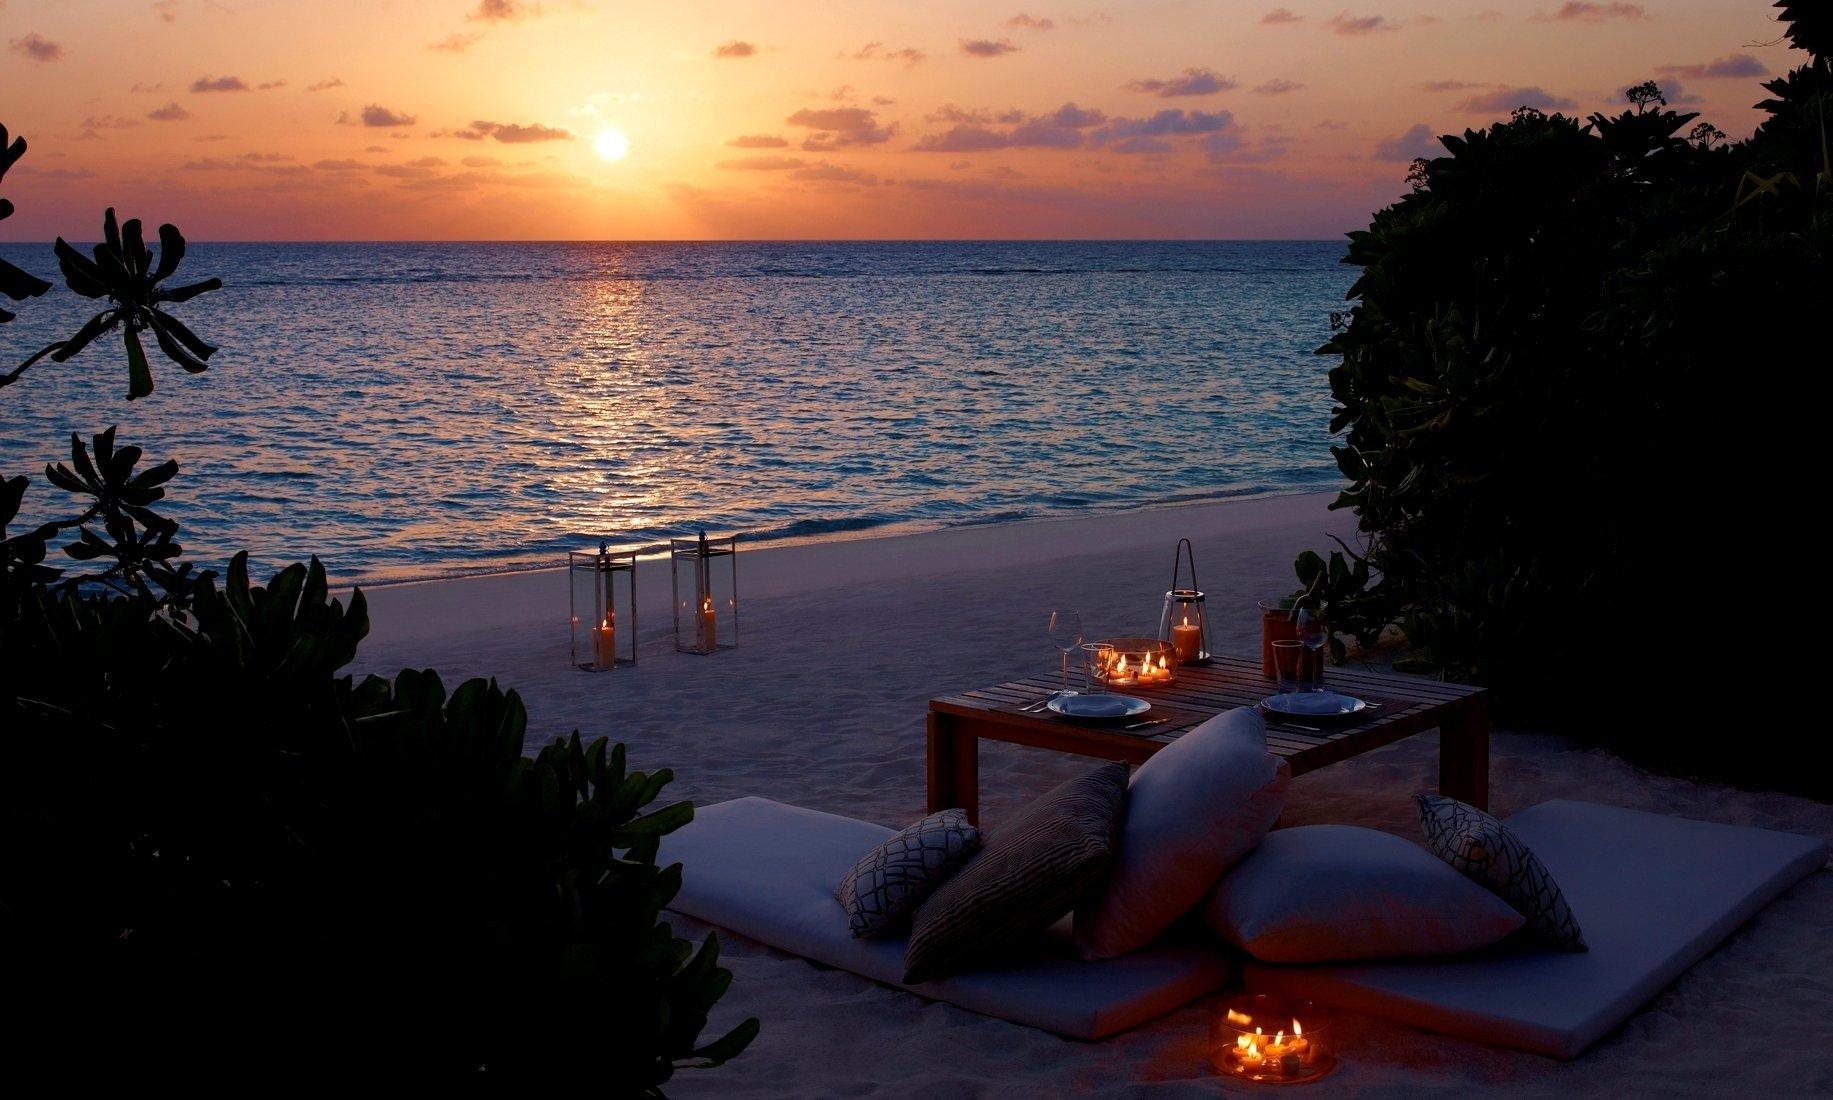 Картинки романтика и пляж